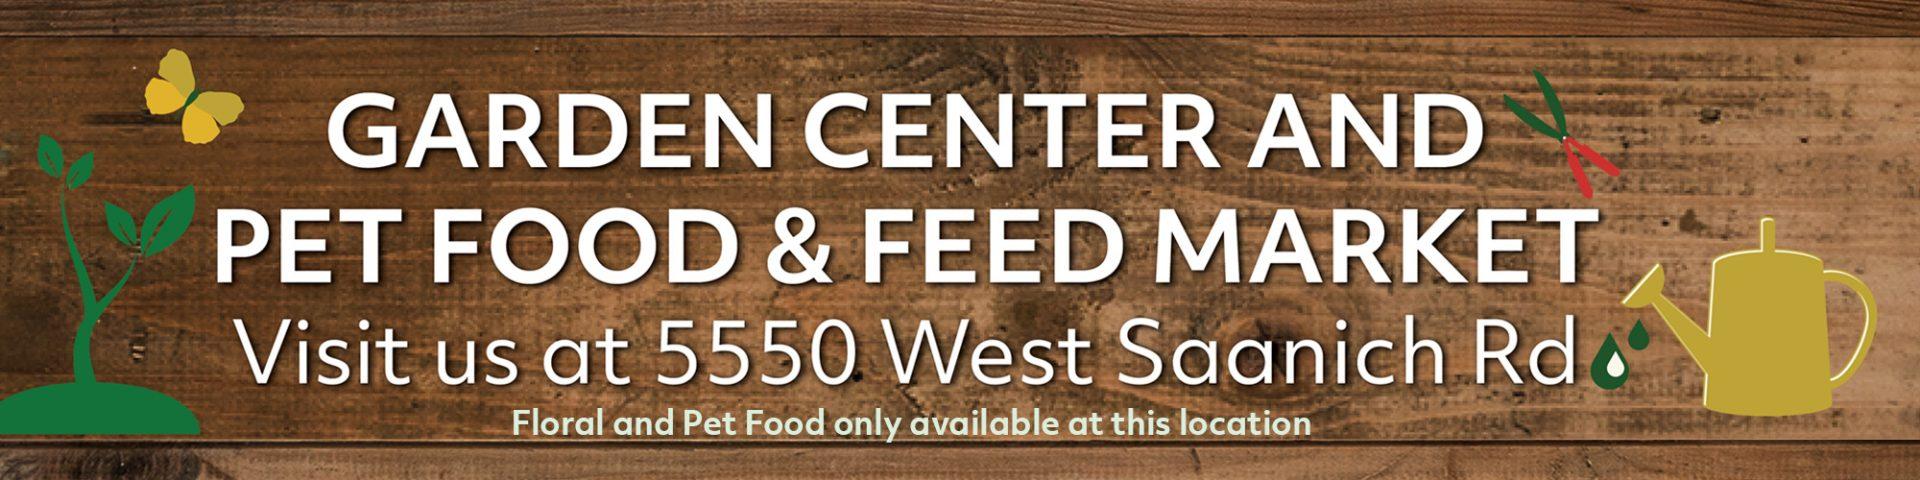 Barn Bucks Bonaza Get $20 Free or More! Feb 21-27 Limited Time Offer